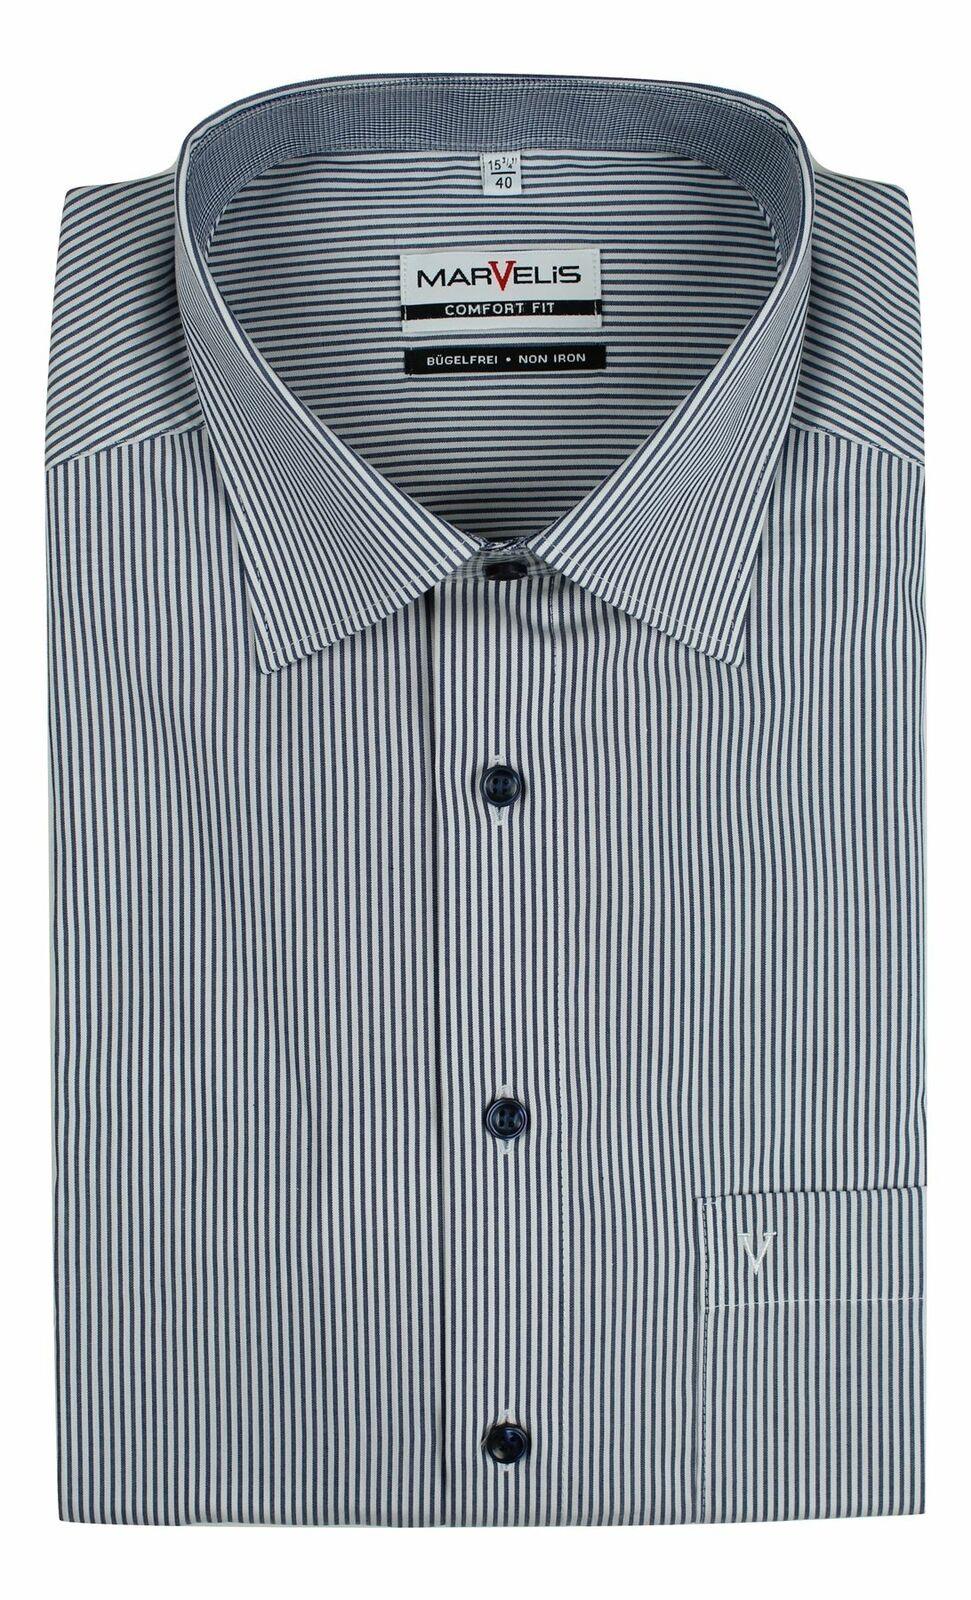 Denim Stripe Contrast Spread Collar